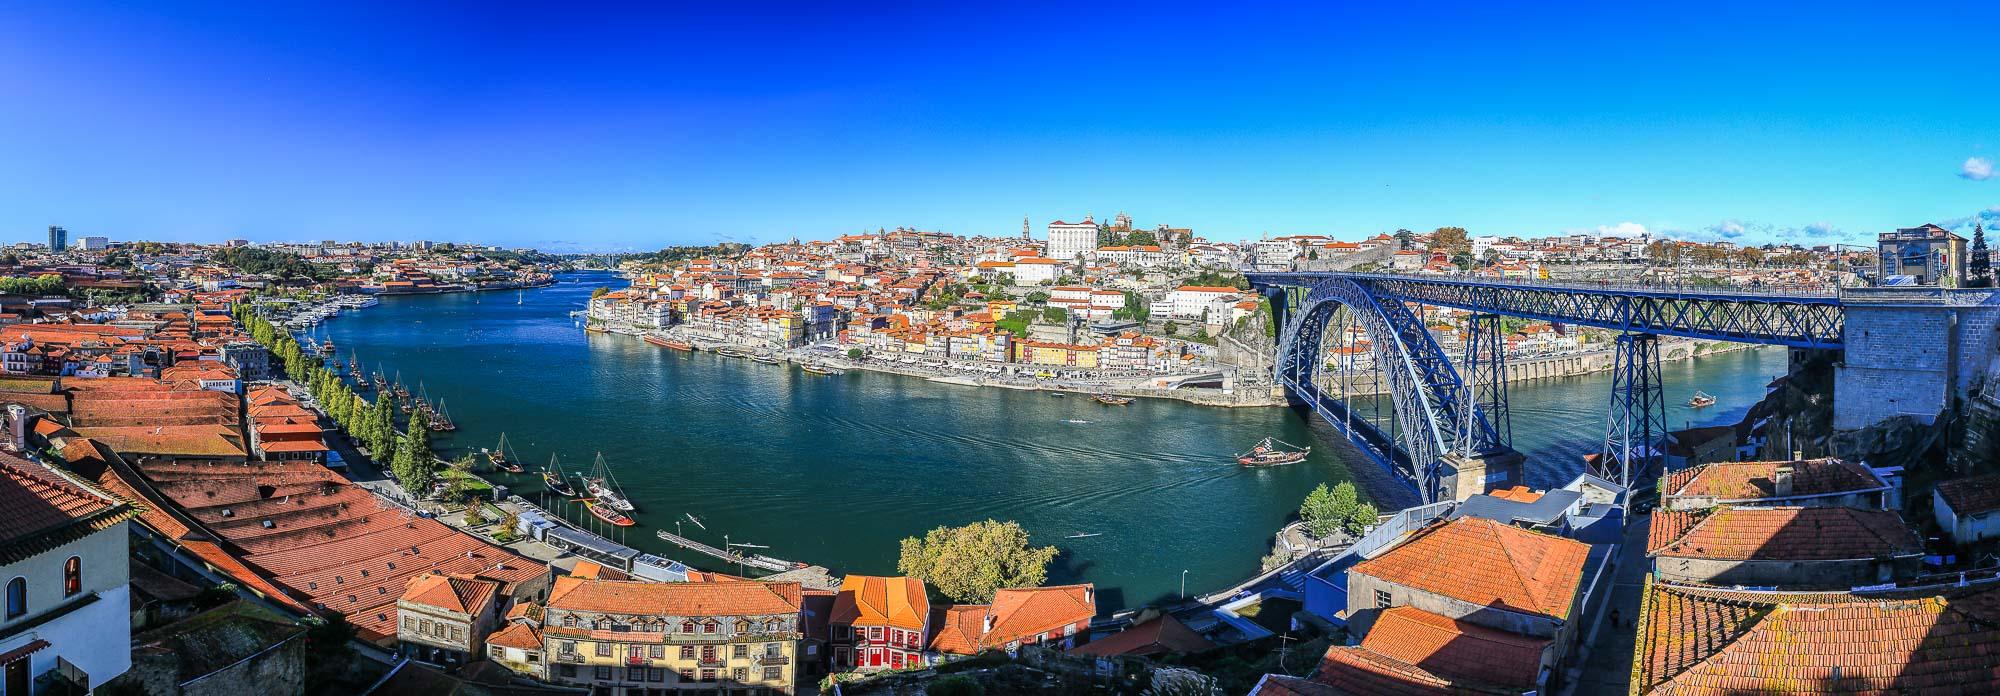 PORTUGAL-2012-jusmedic-#1026-Pano